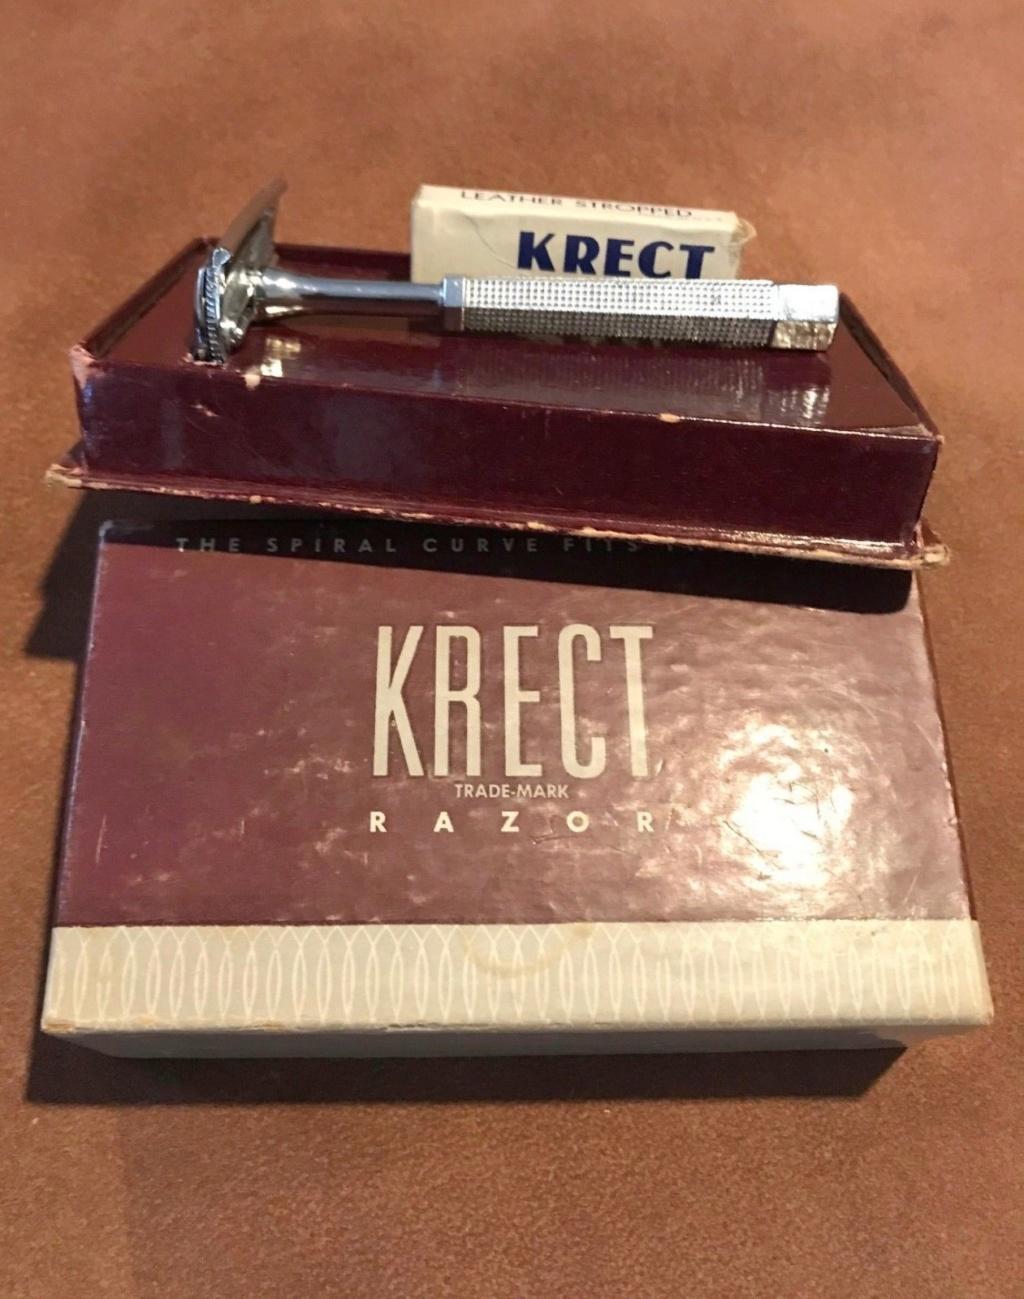 Rasoir Krect Spiral Curve Krect711